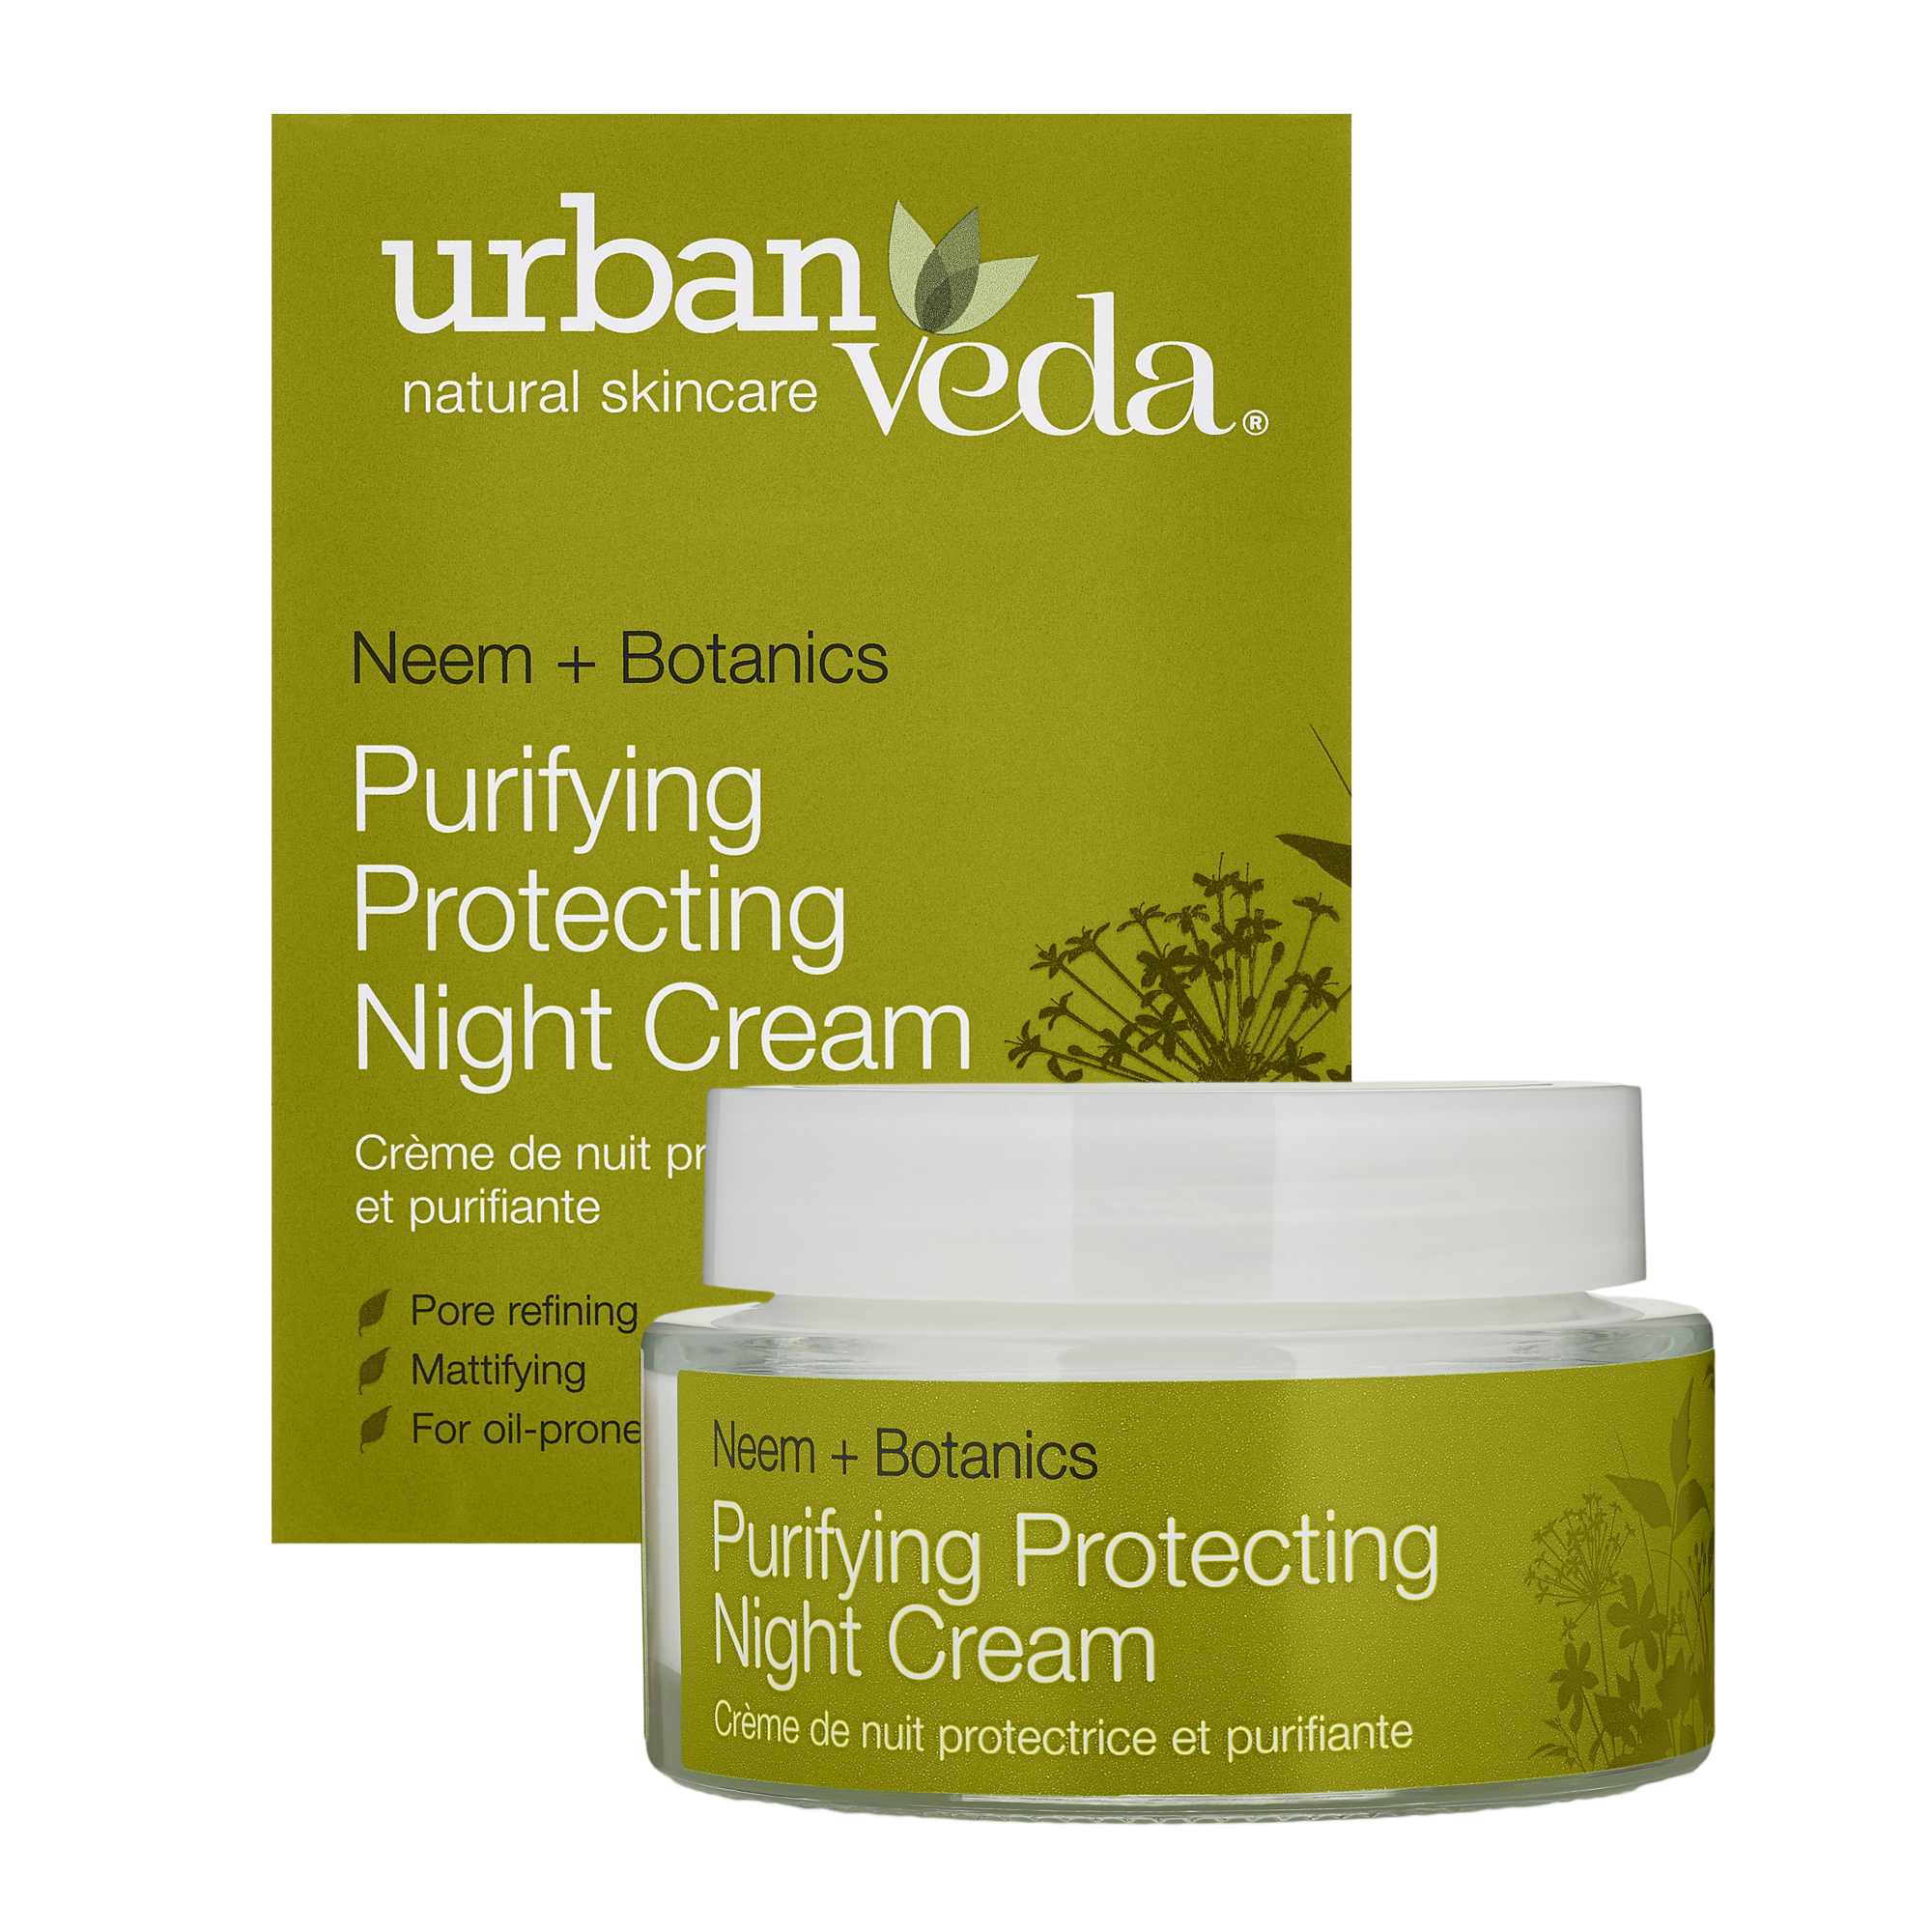 Urban Veda | Urban Veda Purifying Protecting Night Cream 50ml